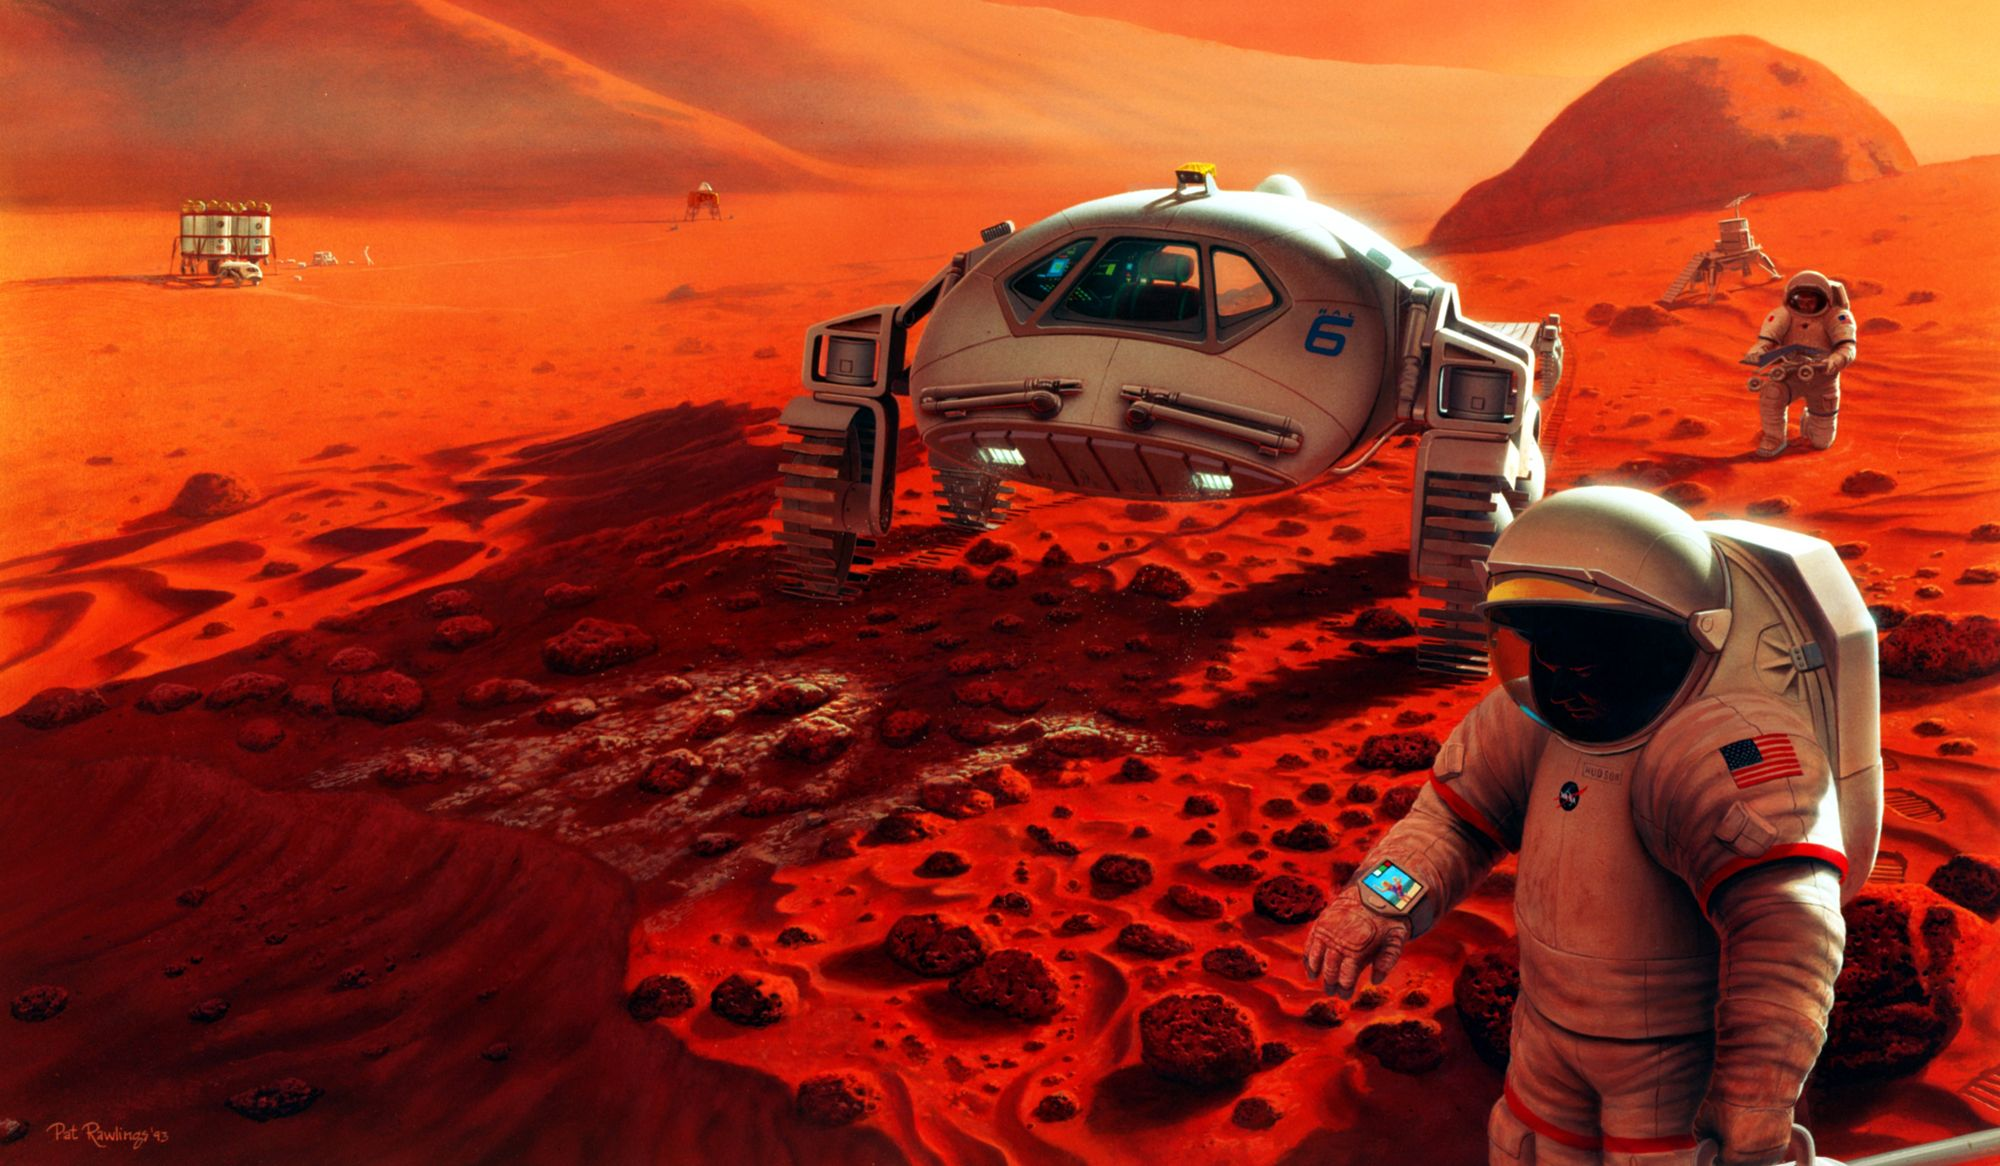 US Needs a Mars Colony, Buzz Aldrin Tells Senators by Mike Wall, Space.com Senior Writer   |  2/26/15